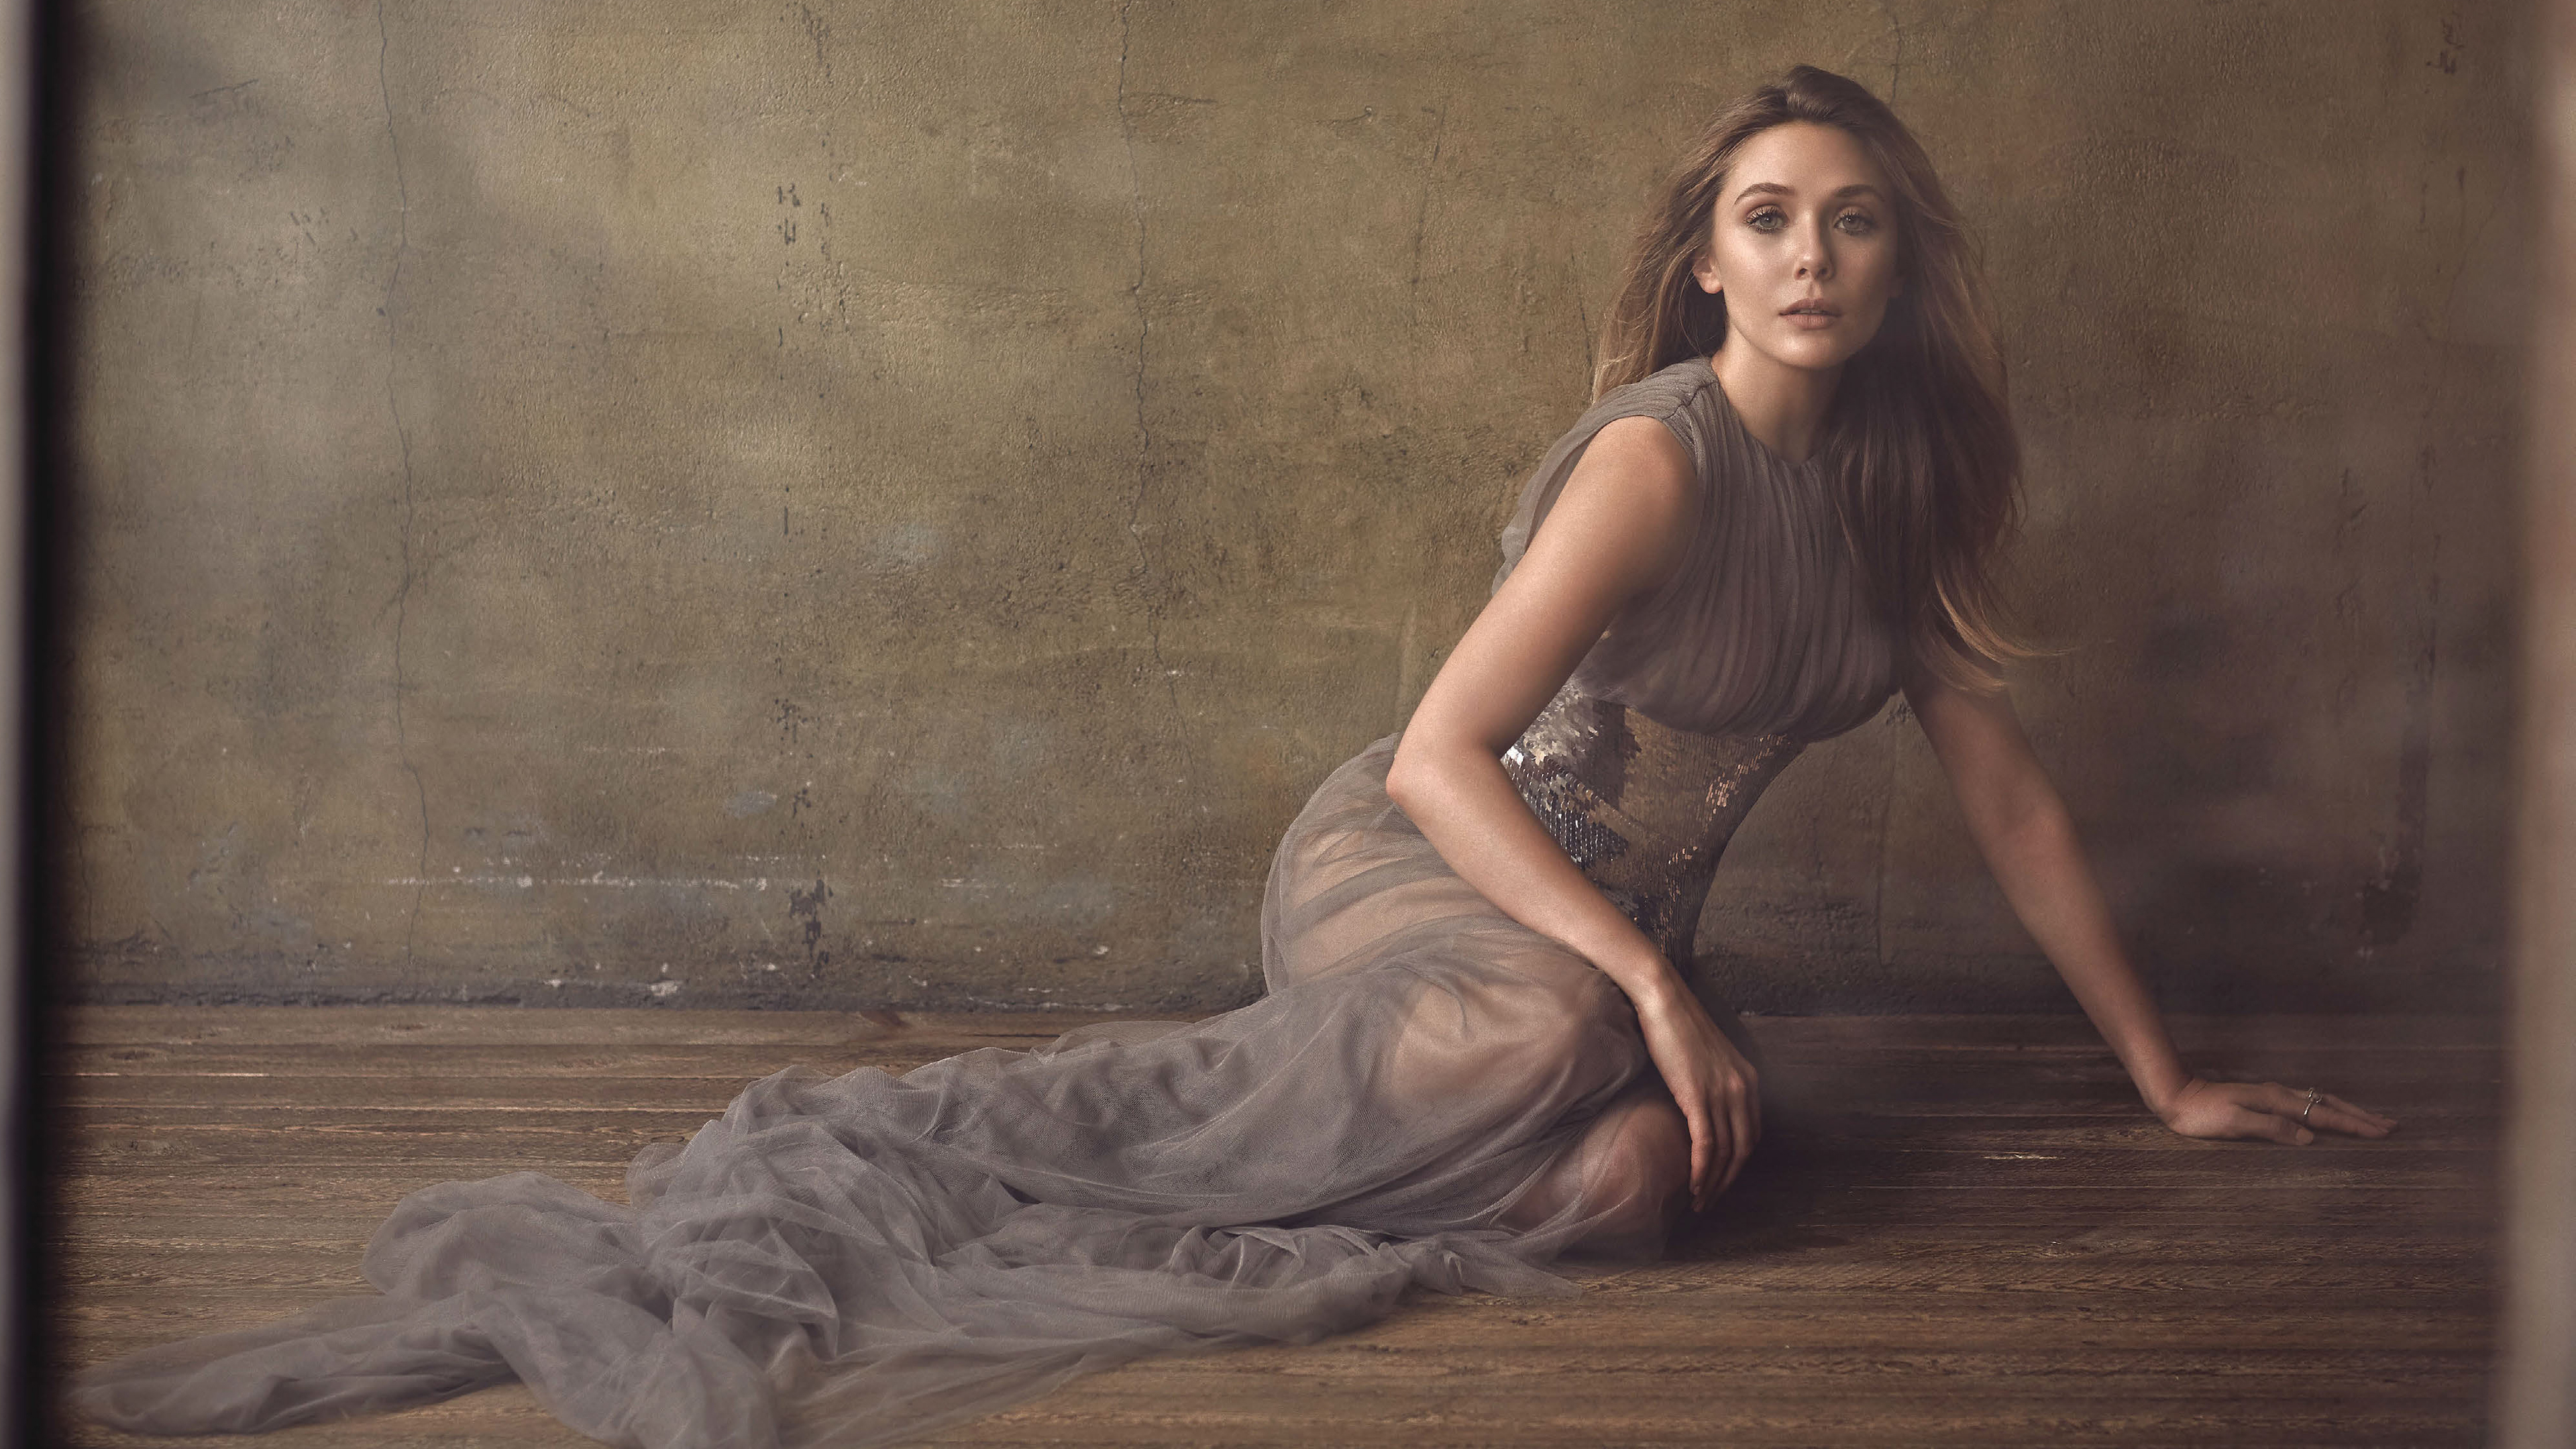 elizabeth olsen 2019 4k 1536945605 - Elizabeth Olsen 2019 4k - hd-wallpapers, girls wallpapers, elizabeth olsen wallpapers, celebrities wallpapers, 4k-wallpapers